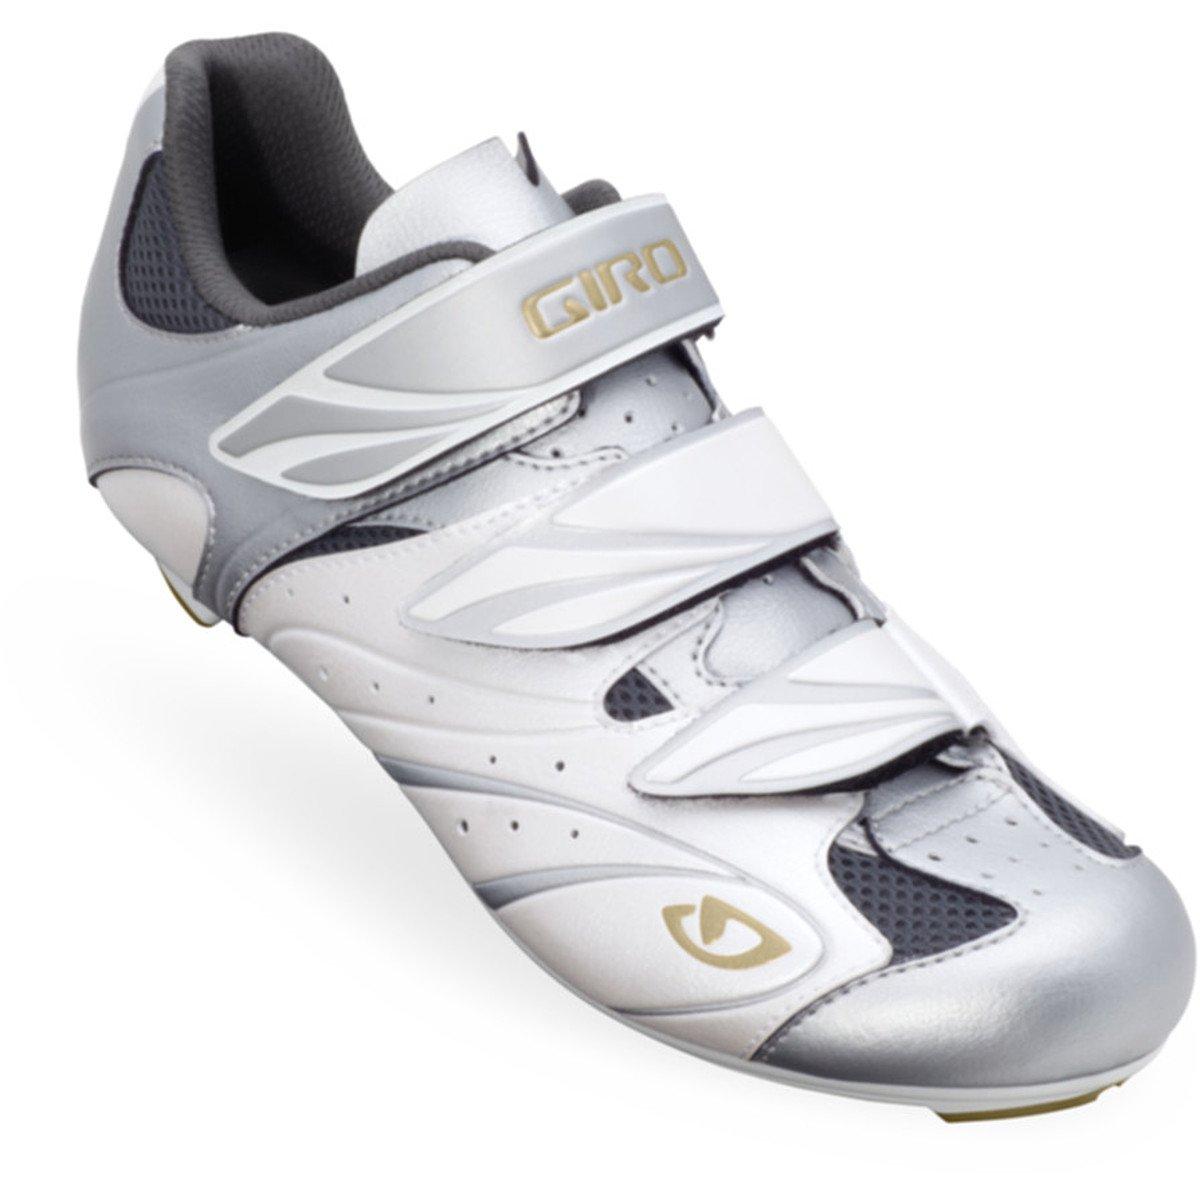 Giro Sante Damen Rennrad Schuhe weiss Größe: 2013: Größe: weiss 43 - d85579